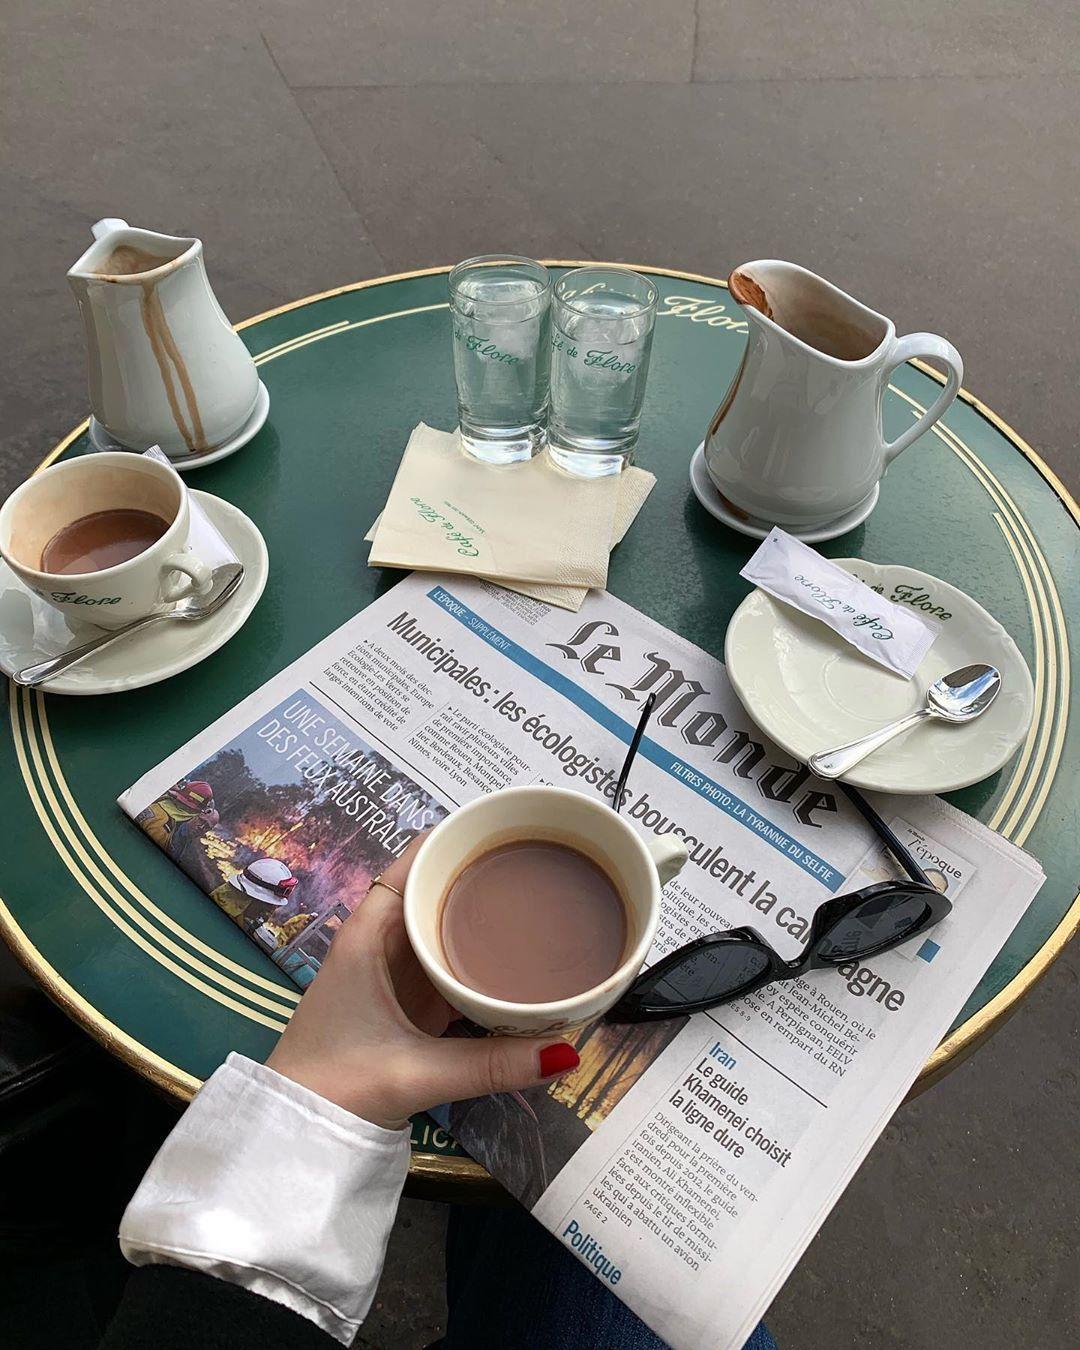 Pin By Victoria Galanesi On Nice In 2020 Coffee Addict Coffee